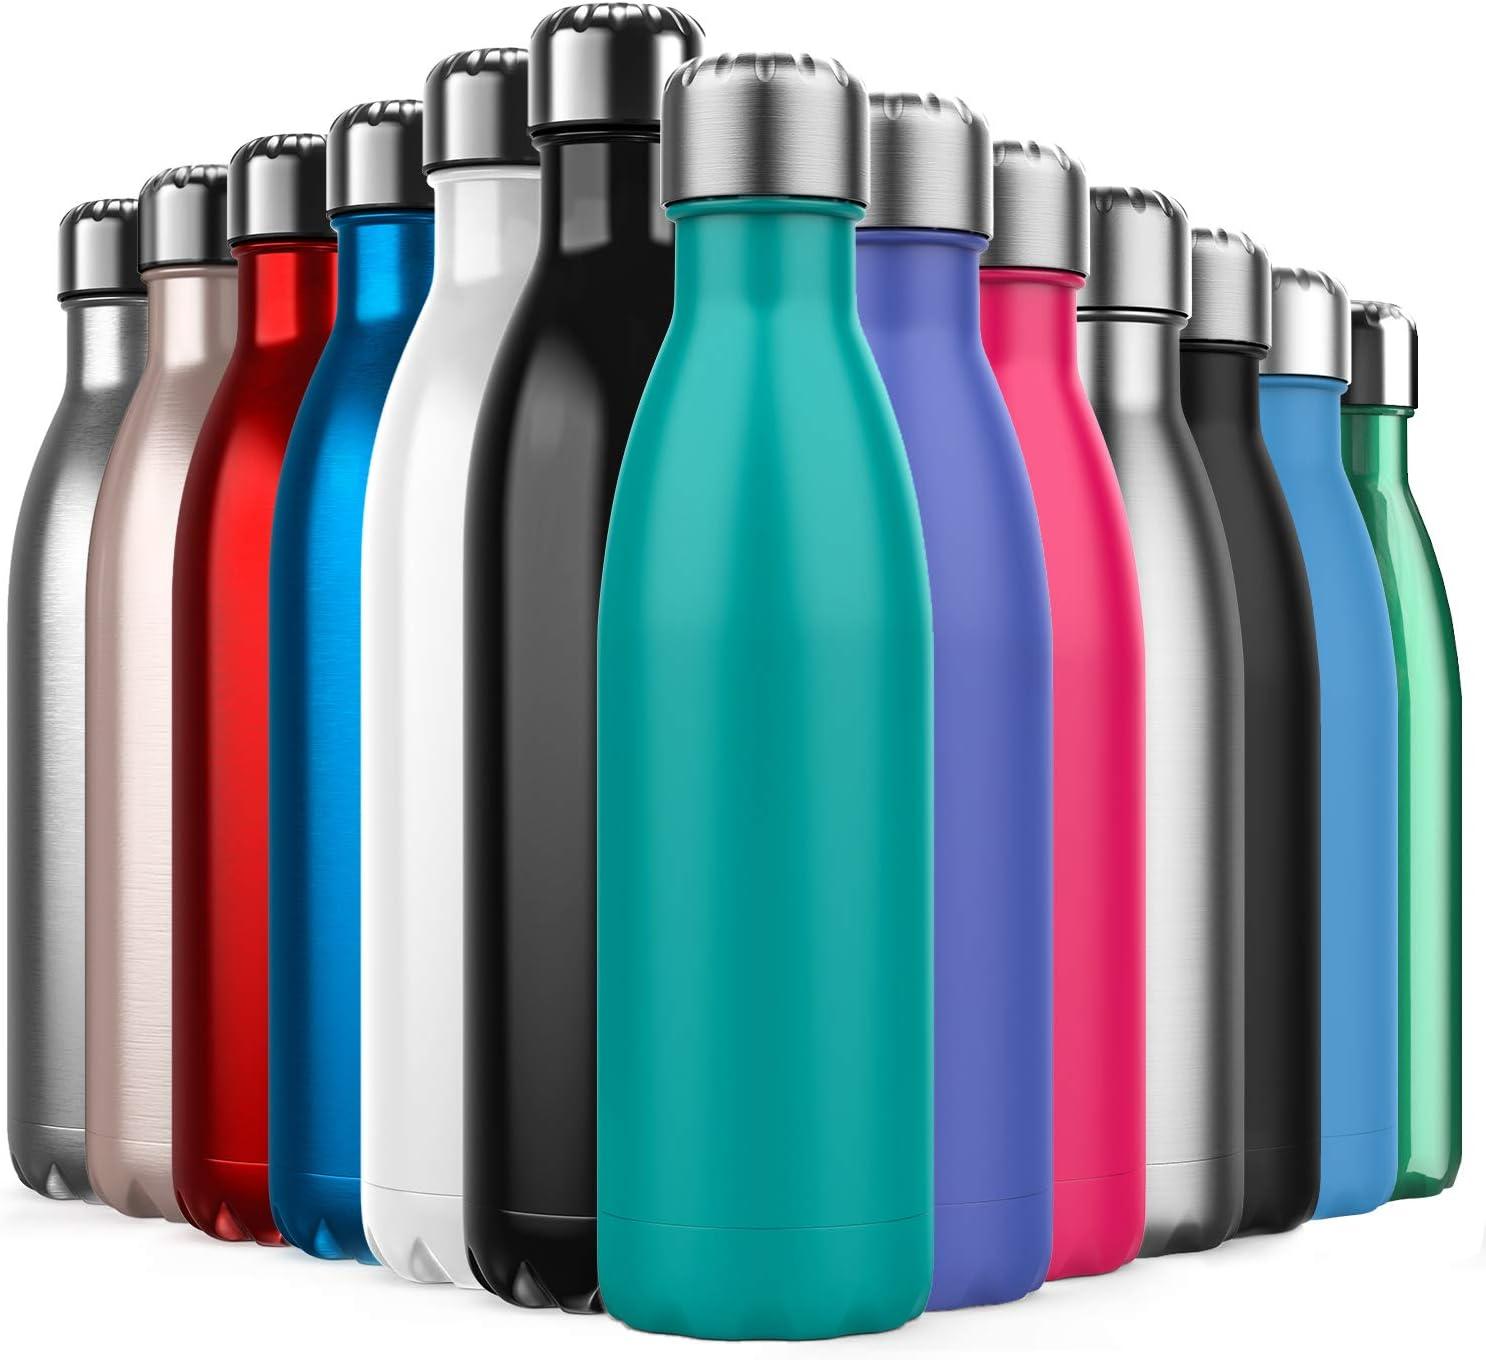 Invool Botella de Agua de Acero Inoxidable,Diseño de Pared Doble,Boca EstáNdar,para Correr,Gimnasio,Yoga,Ciclismo,500ML,Azul Turquesa